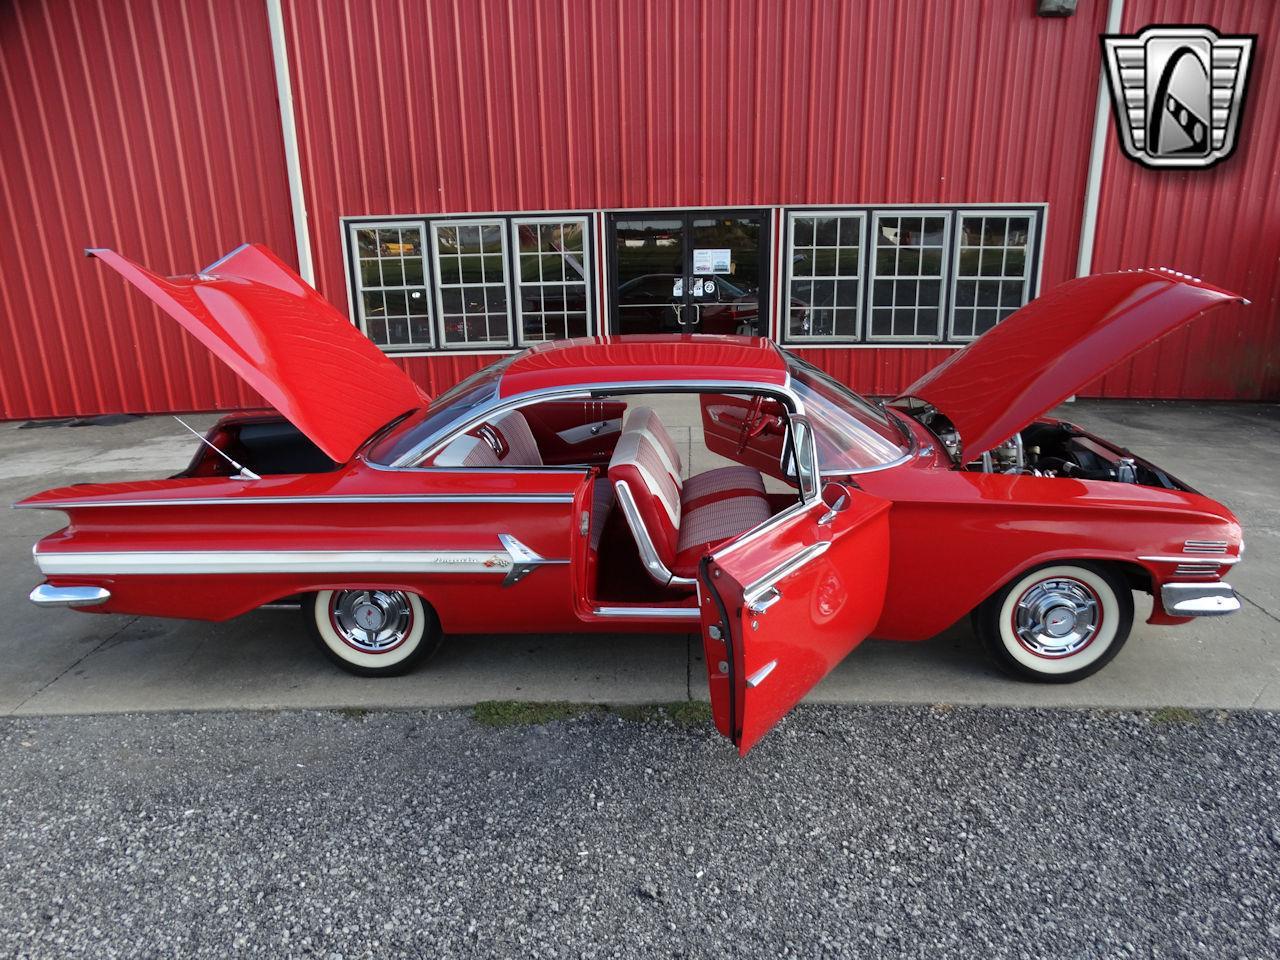 1960 Chevrolet Impala (CC-1411202) for sale in O'Fallon, Illinois